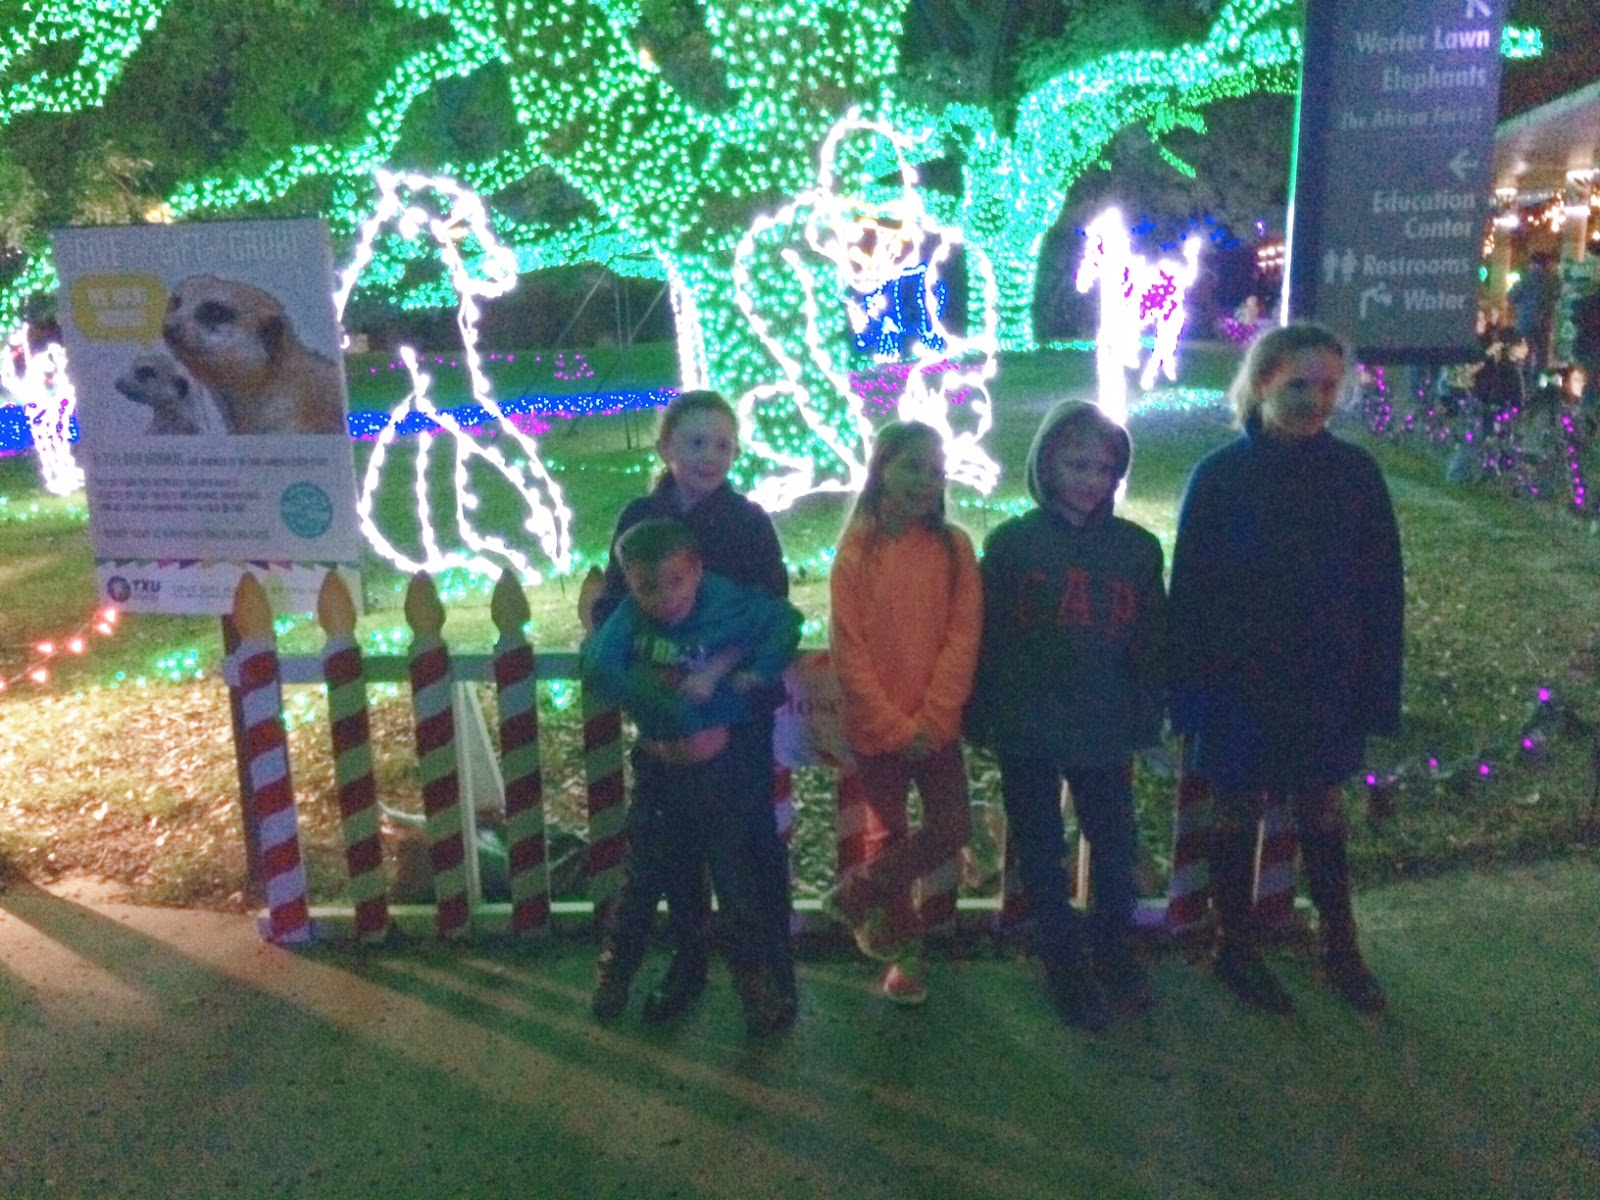 Texas Tigers Houston Zoo Lights